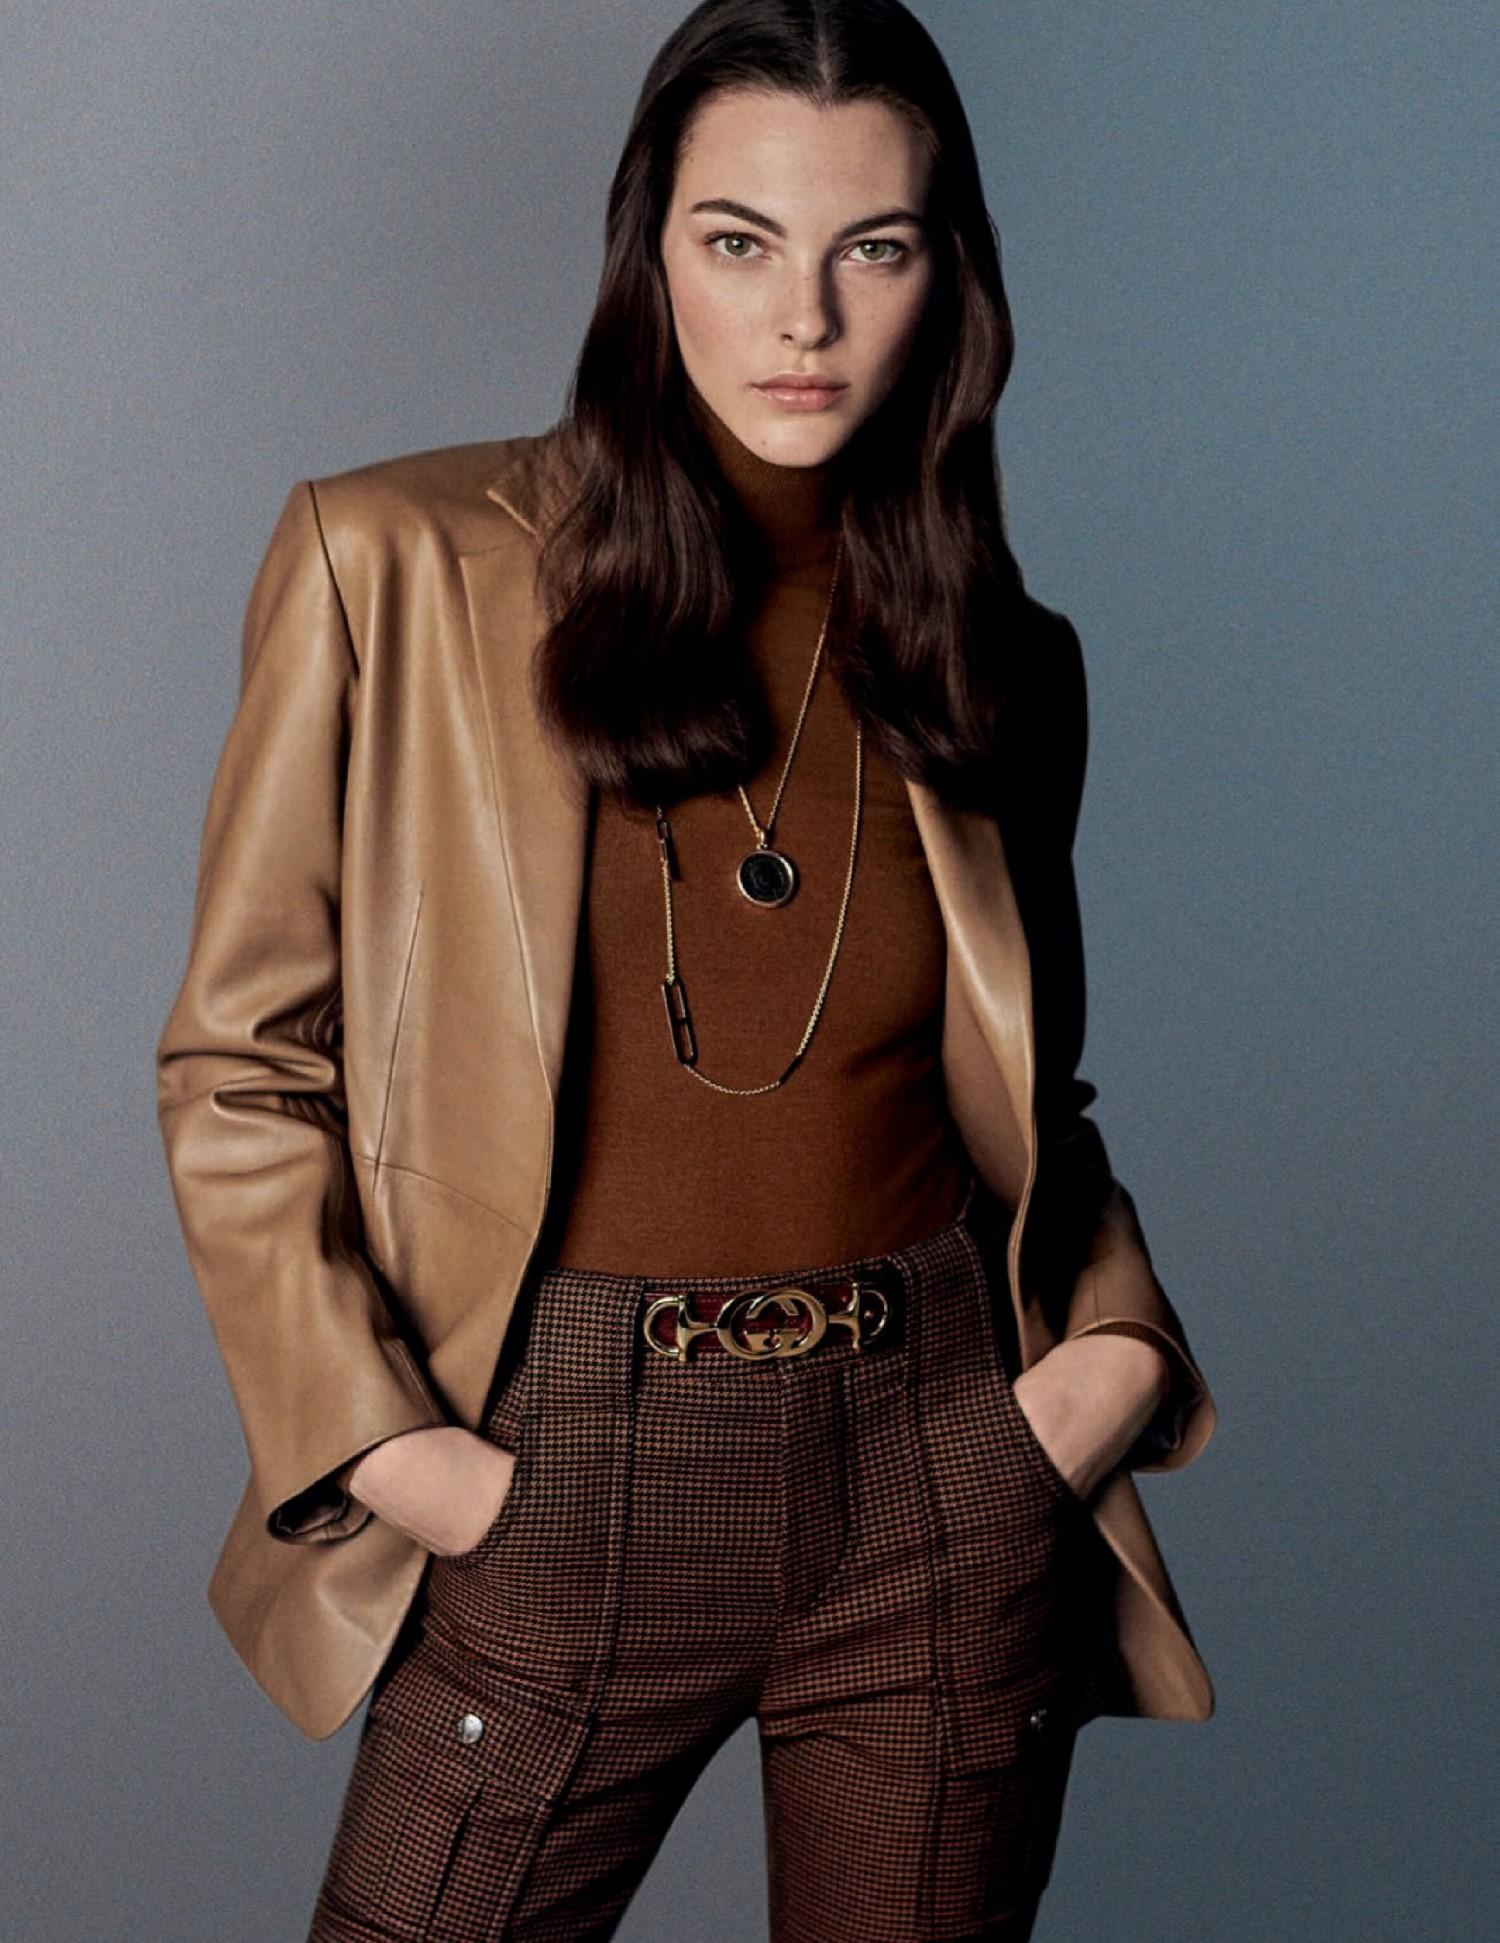 Vittoria Ceretti by Giampaolo Sgura for Vogue Paris Sept 2019 (4).jpg